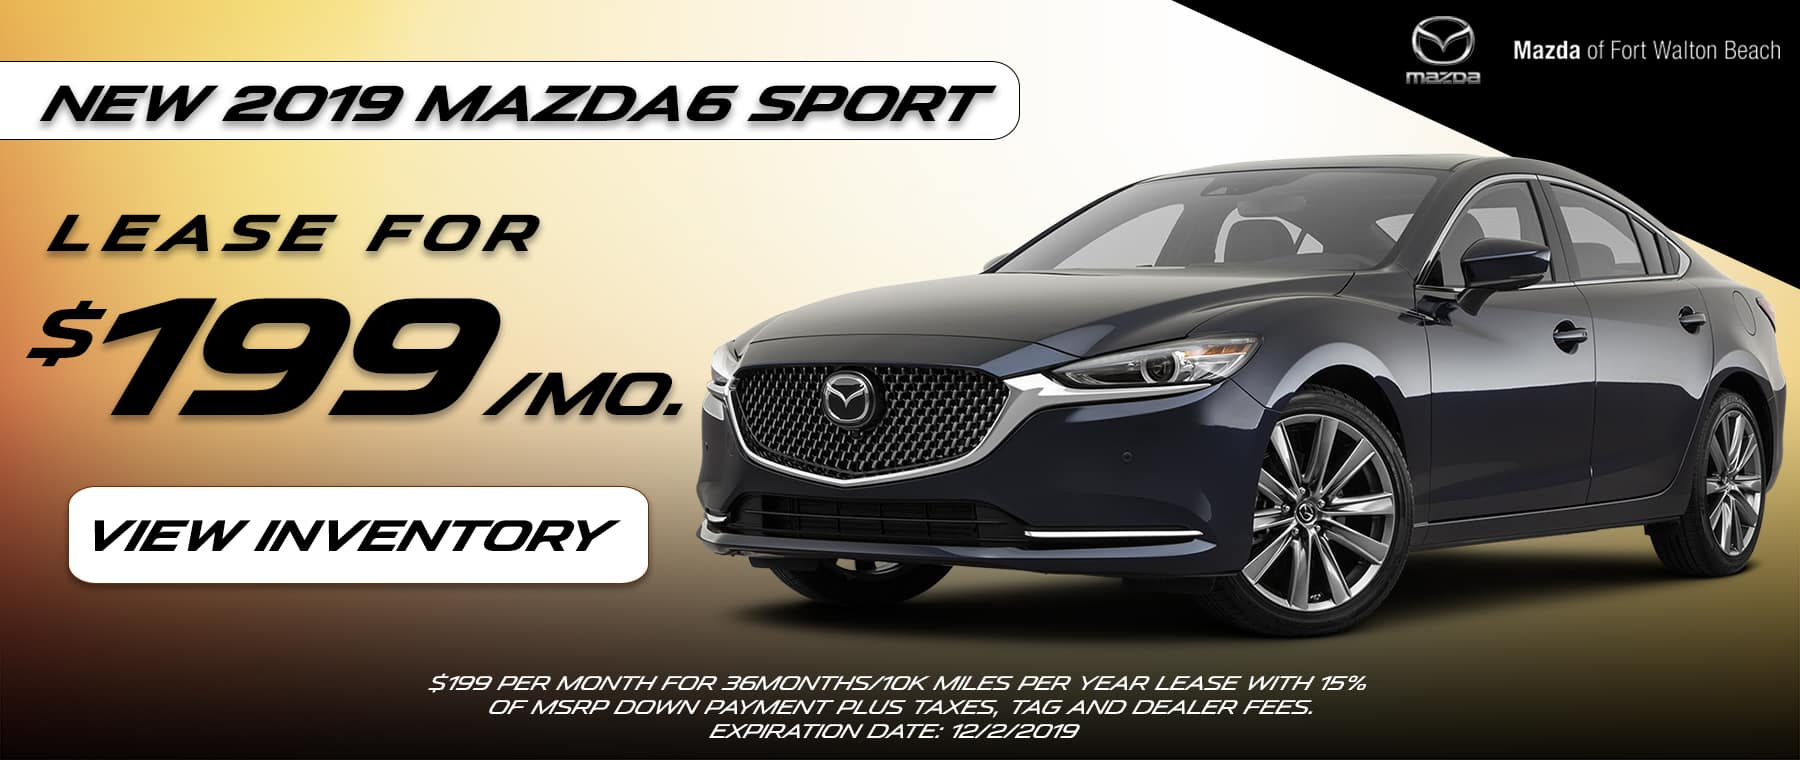 2019 Mazda6 Sport Lease Offer | Mazda of Fort Walton Beach